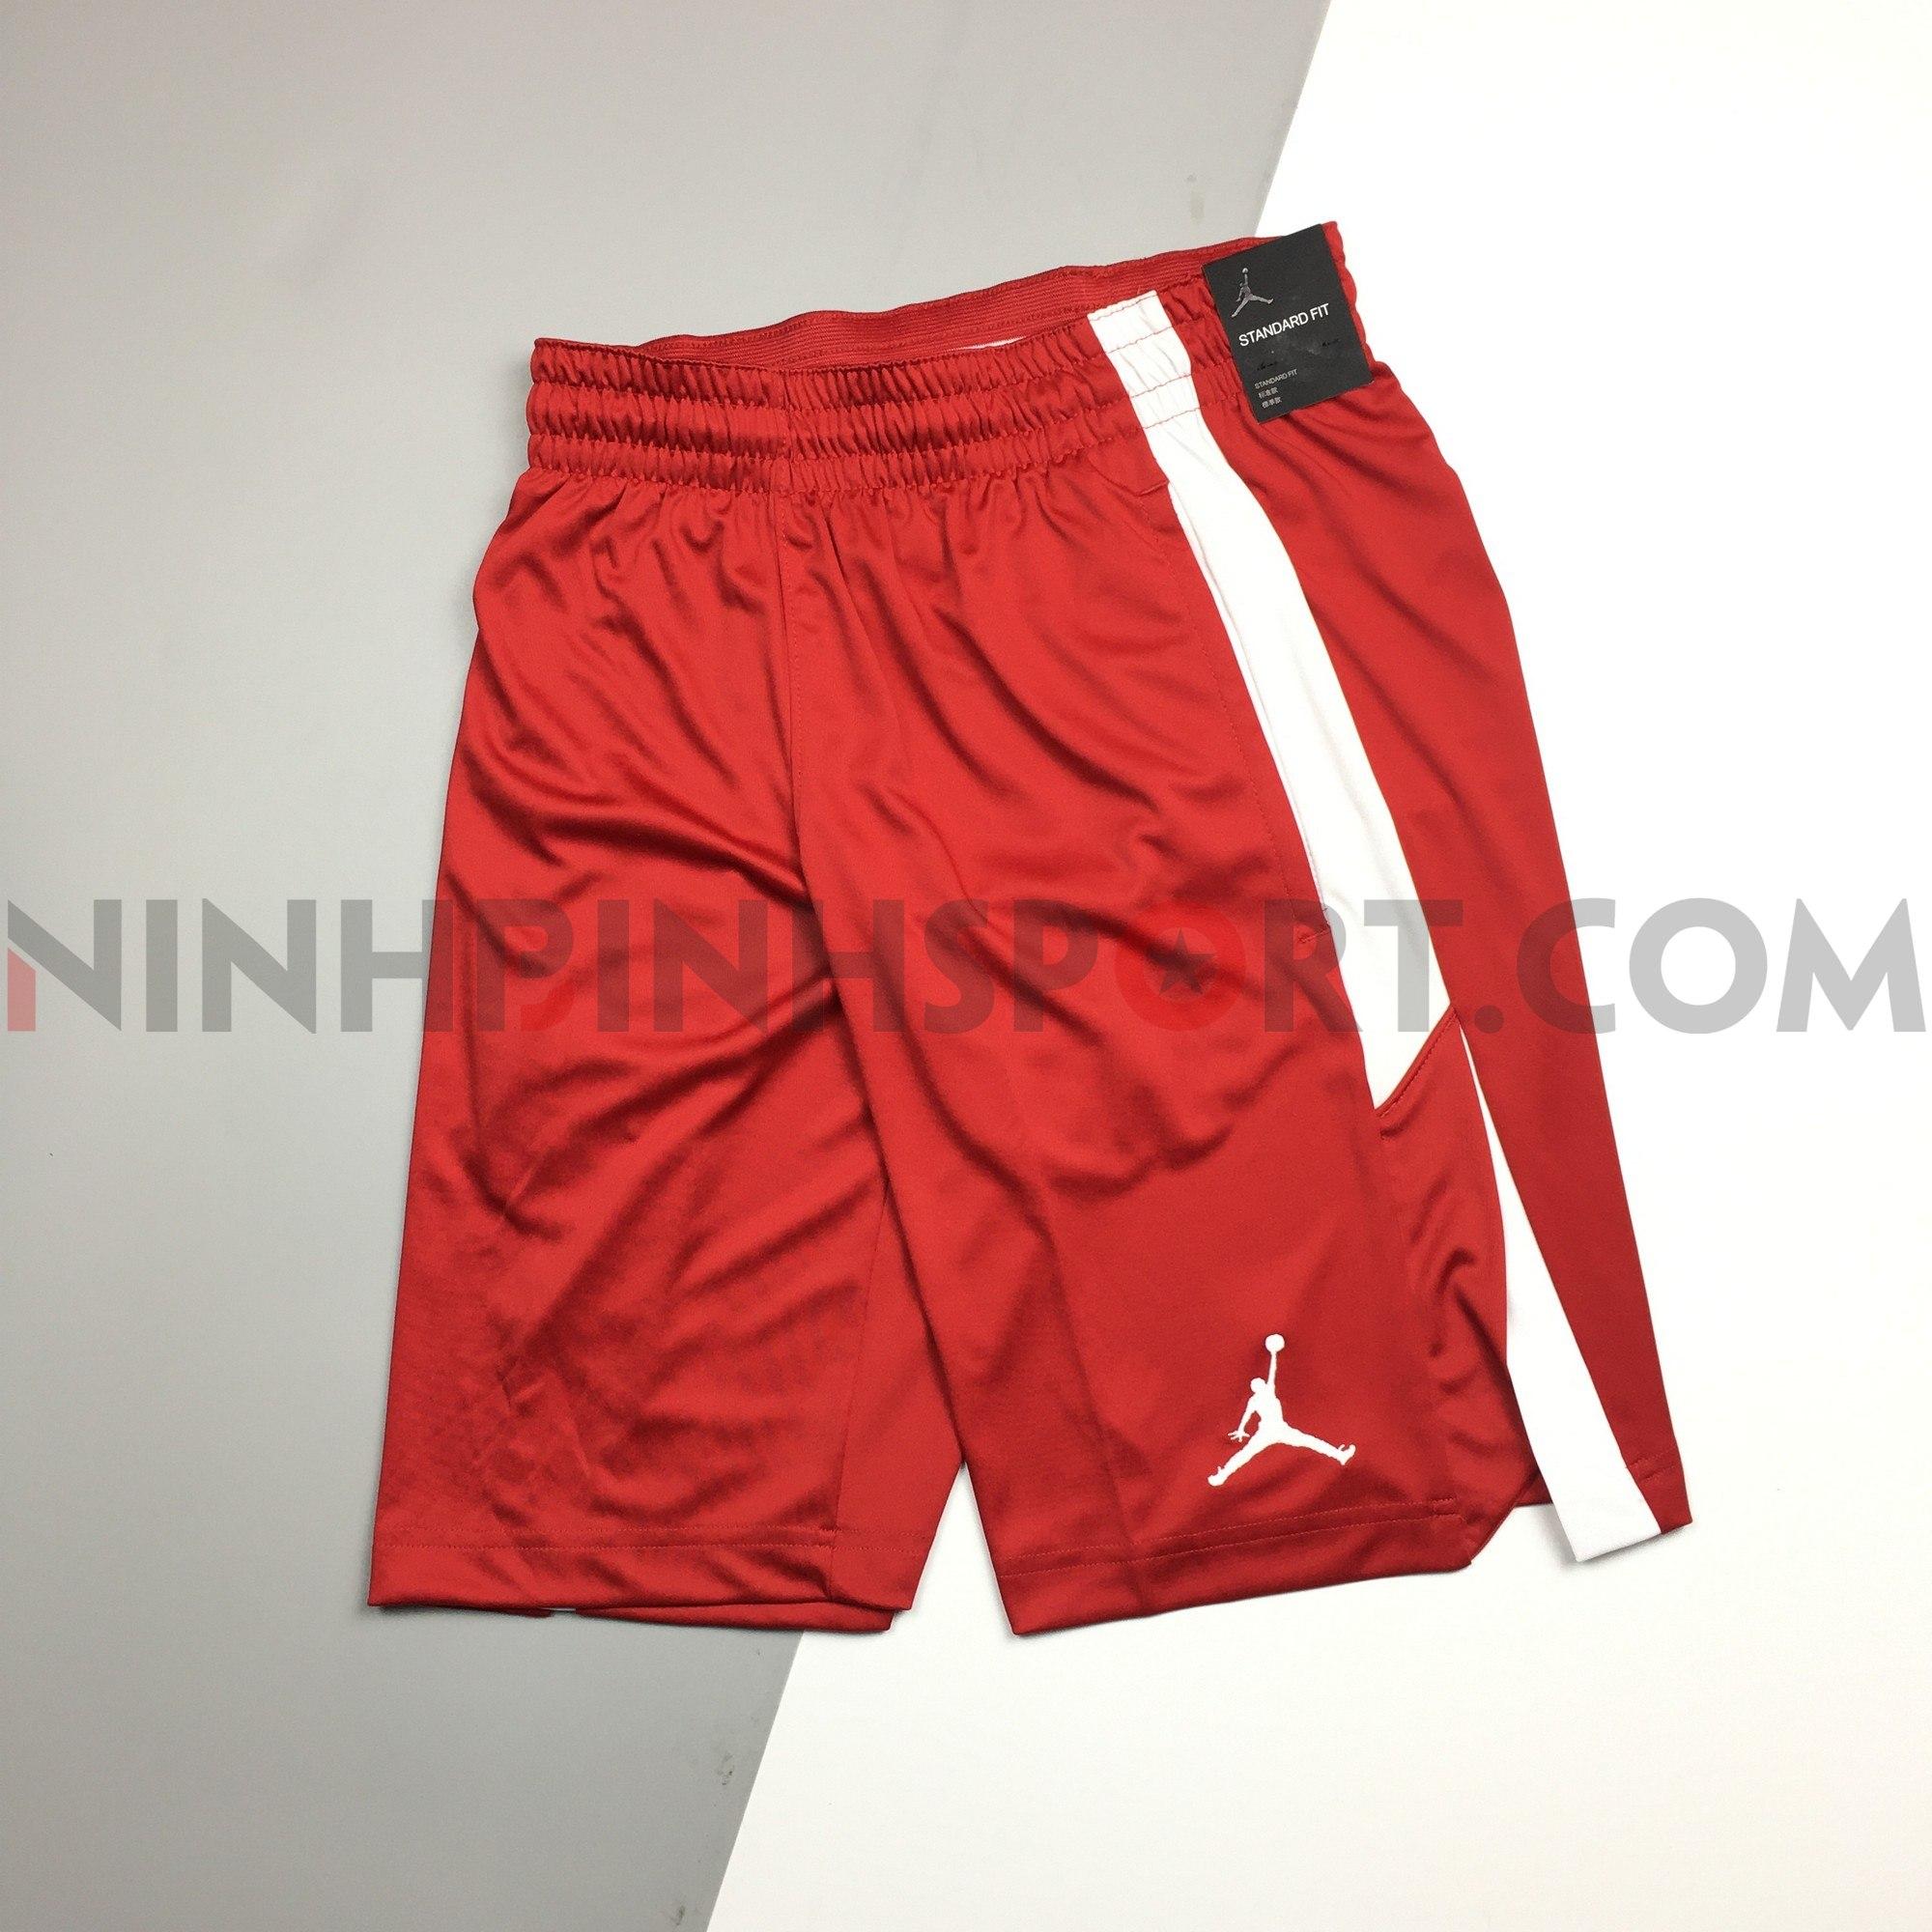 Quần thể thao nam Nike Jordan Dri-fit 23 Alpha 905782-688